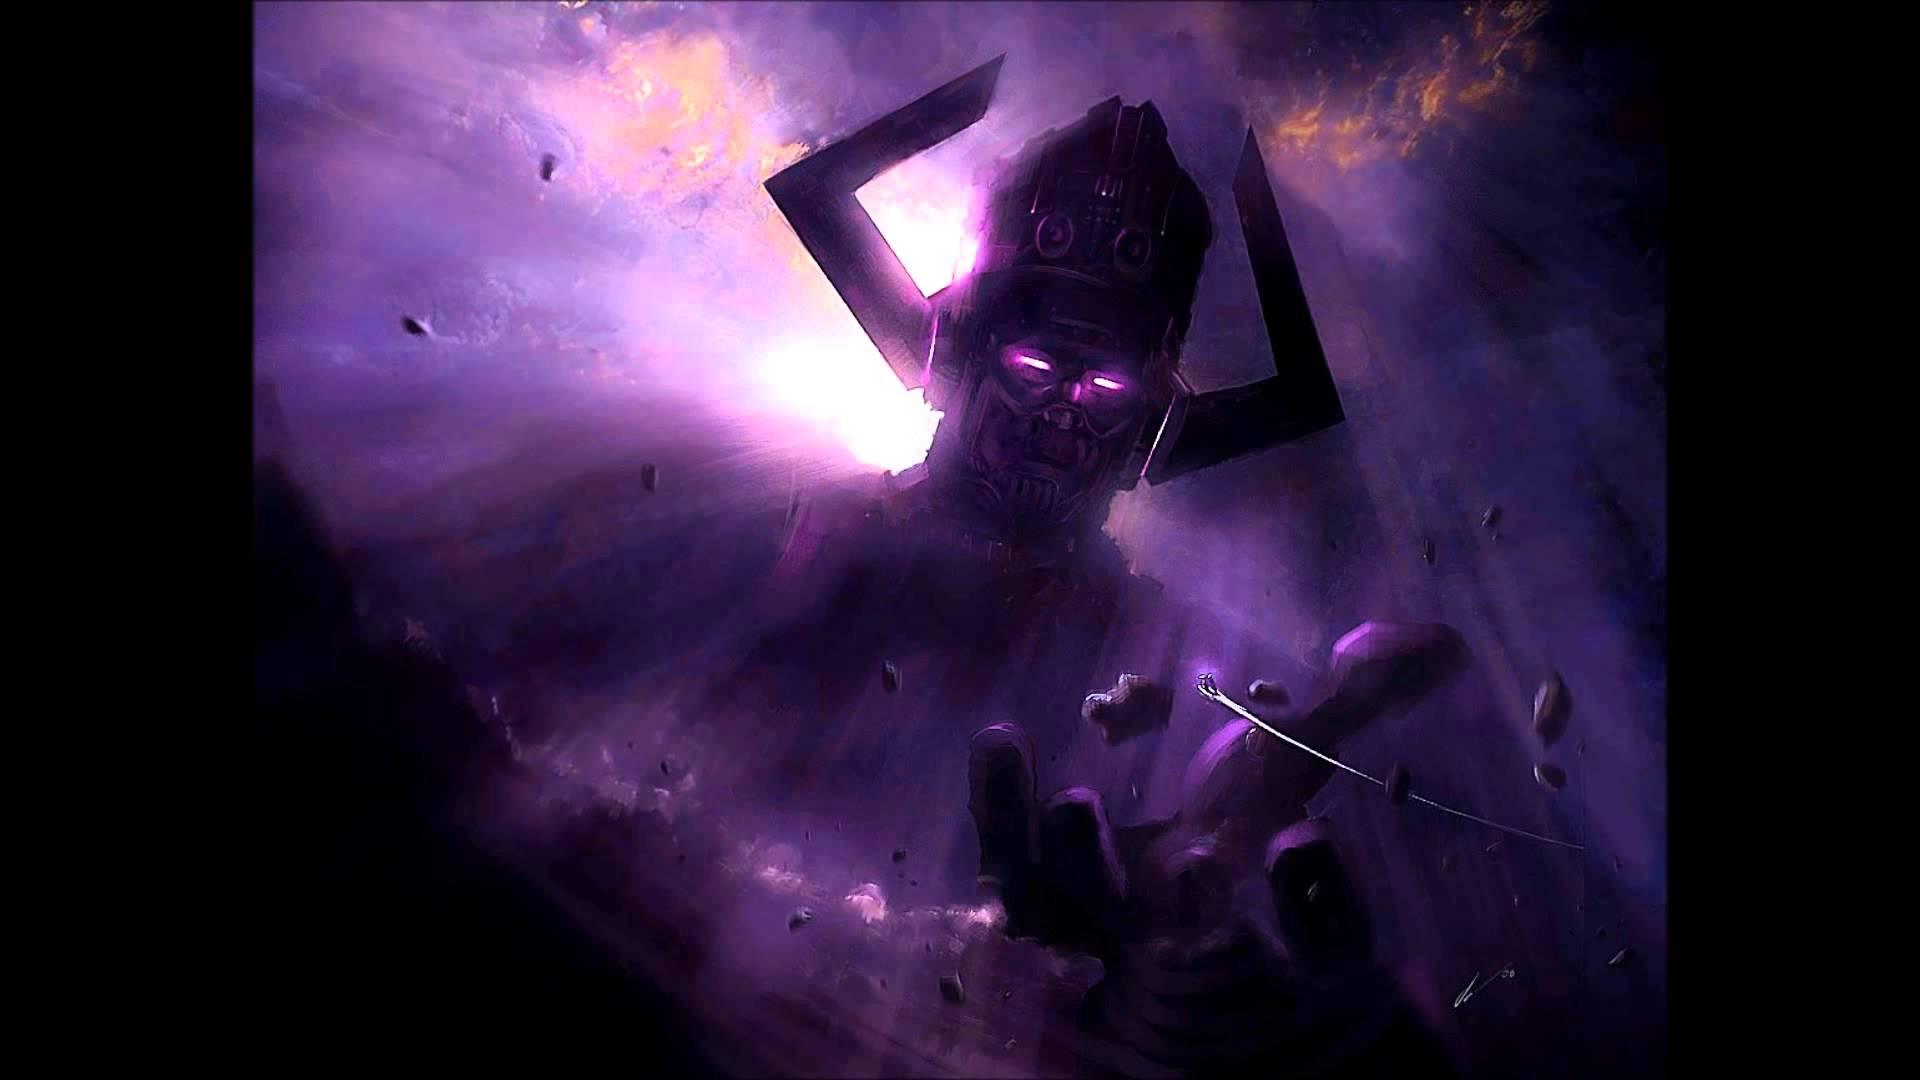 Gorr vs Galactus whowouldwin 1920x1080